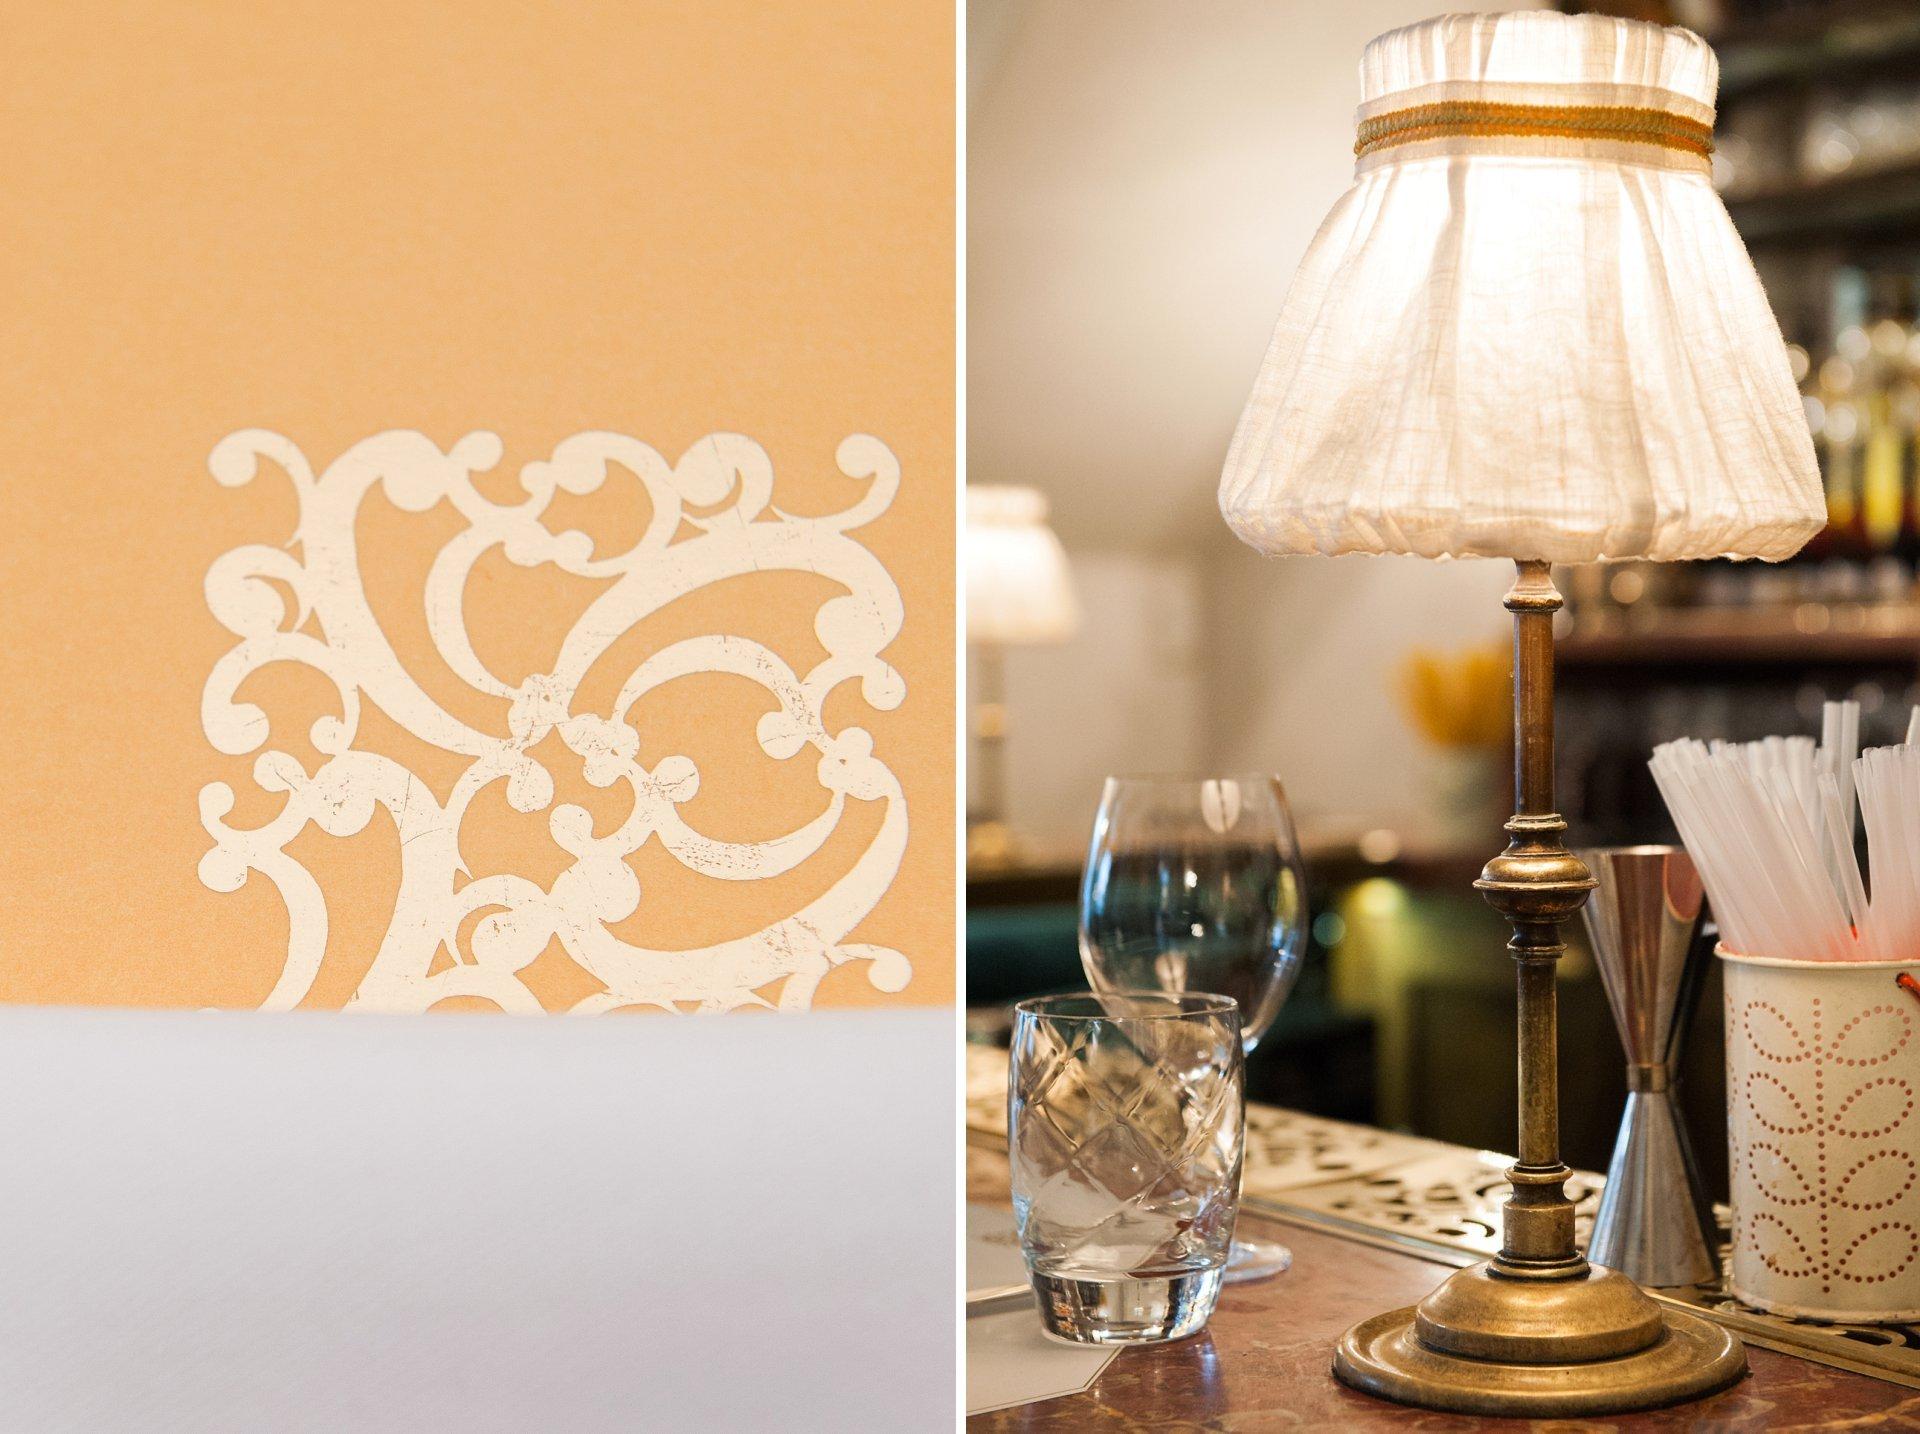 Elegant Italian decor in Daphne's South Kensington